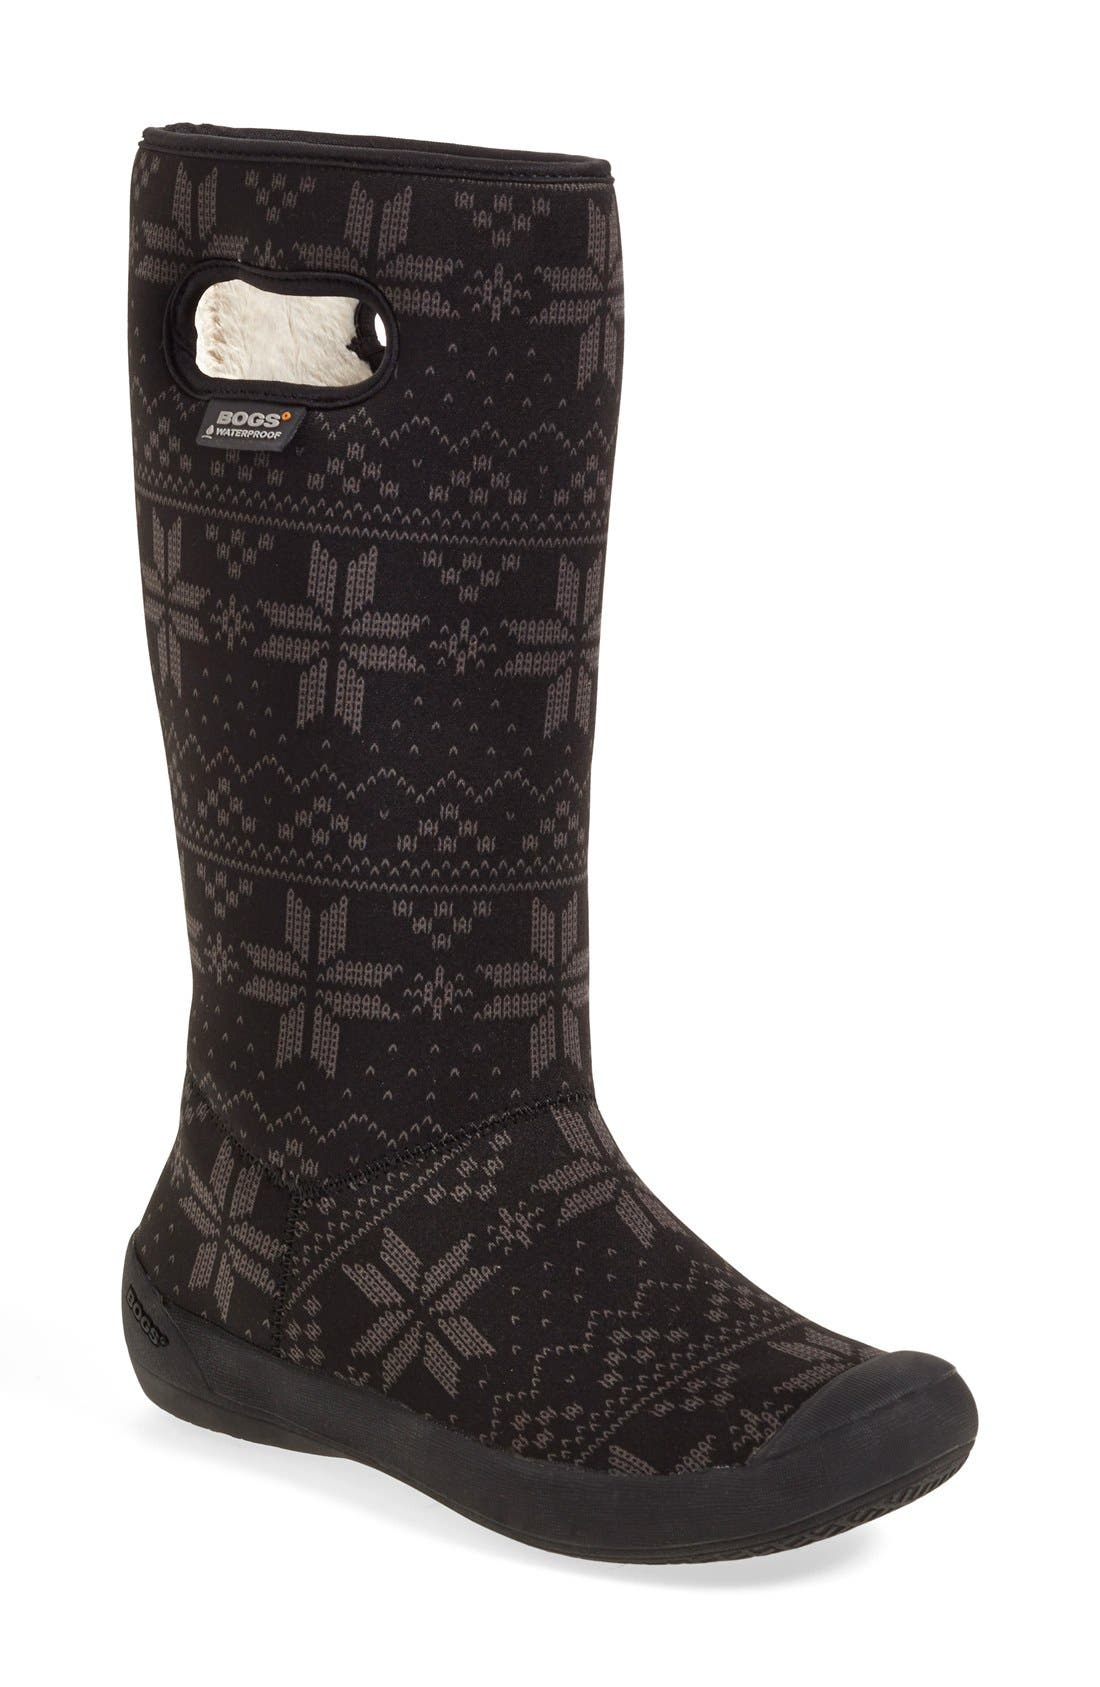 Alternate Image 1 Selected - Bogs 'Summit - Sweater' Waterproof Boot (Women)